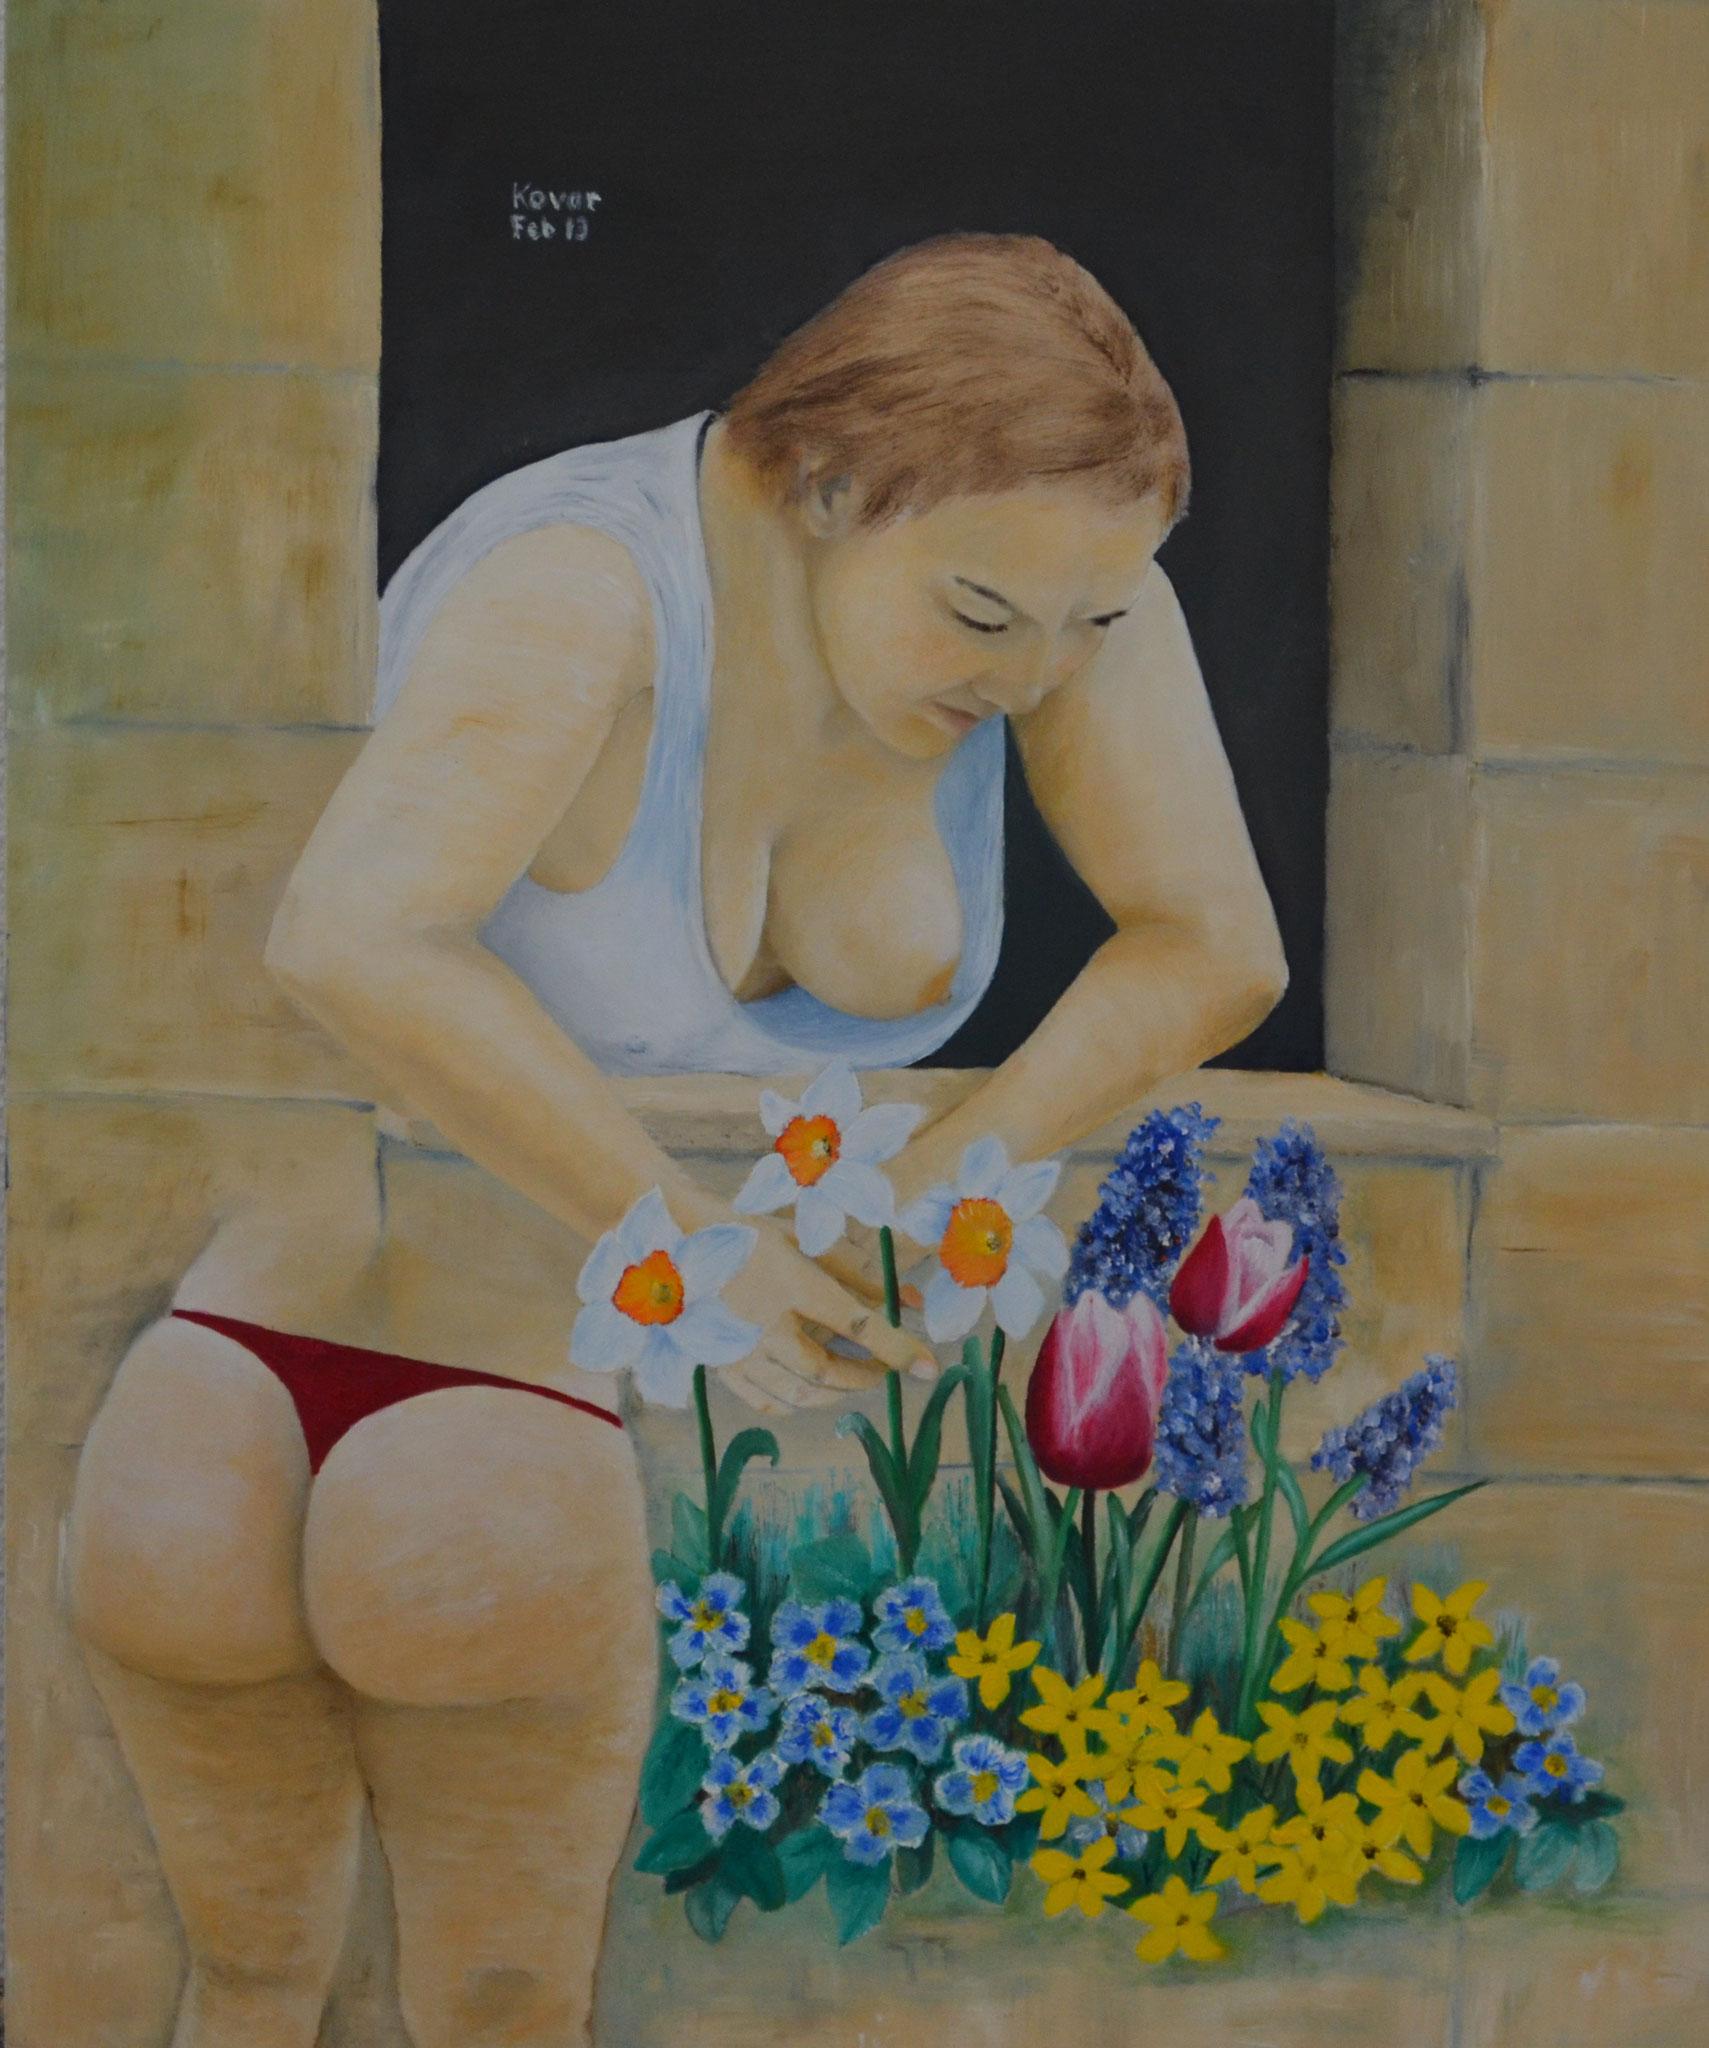 Frühlingserwachen / Spring awakening, Öl auf Leinwand 44x54cm, 2013 ,Oil on Canvas.